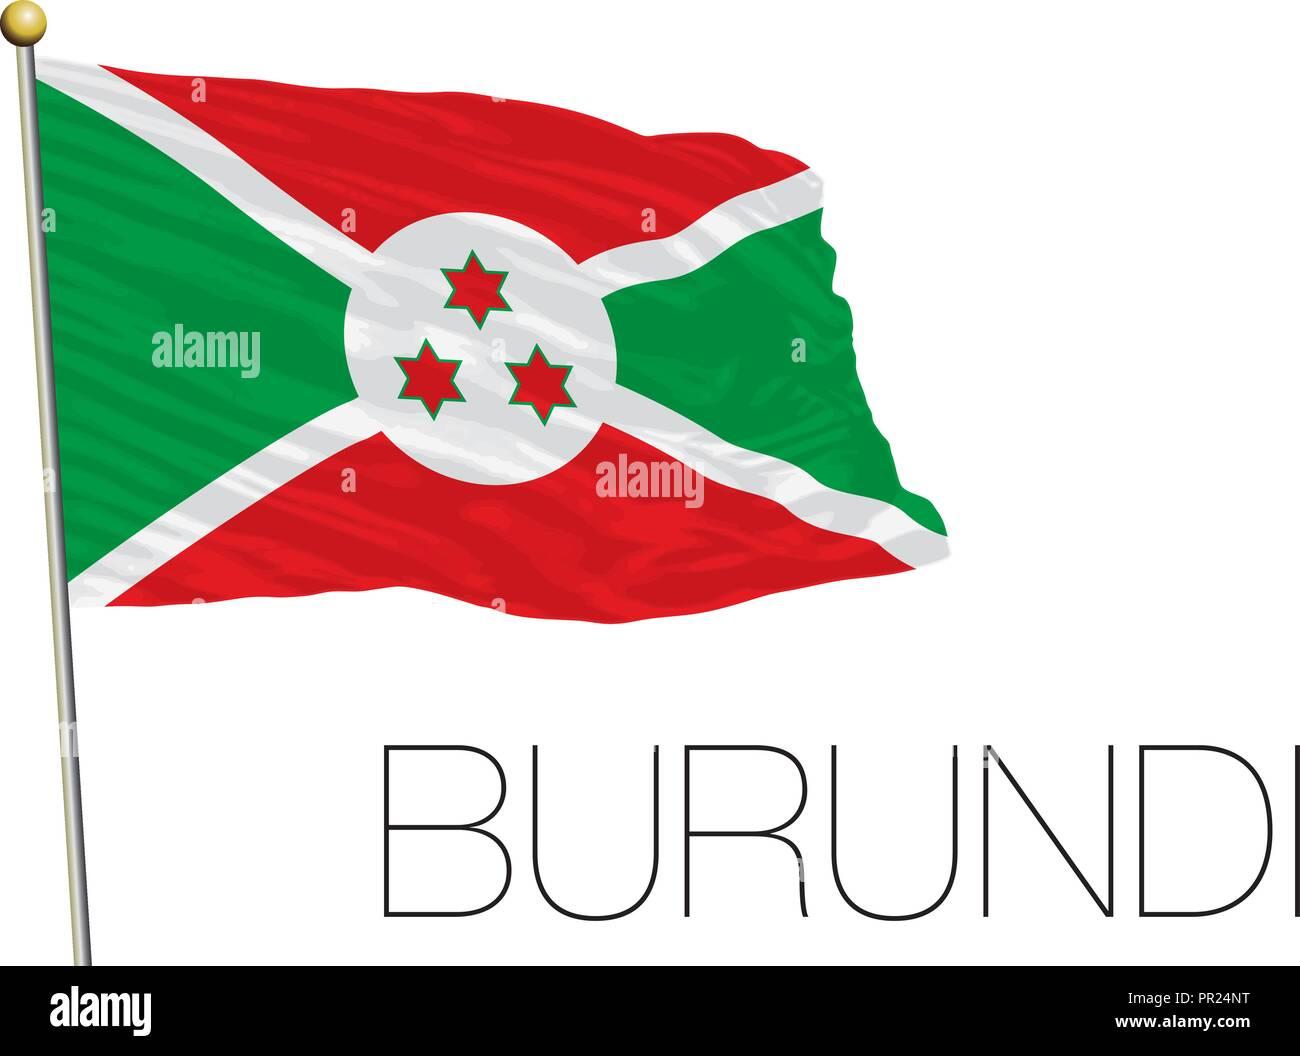 Burundi flag, vector illustration, africa - Stock Image